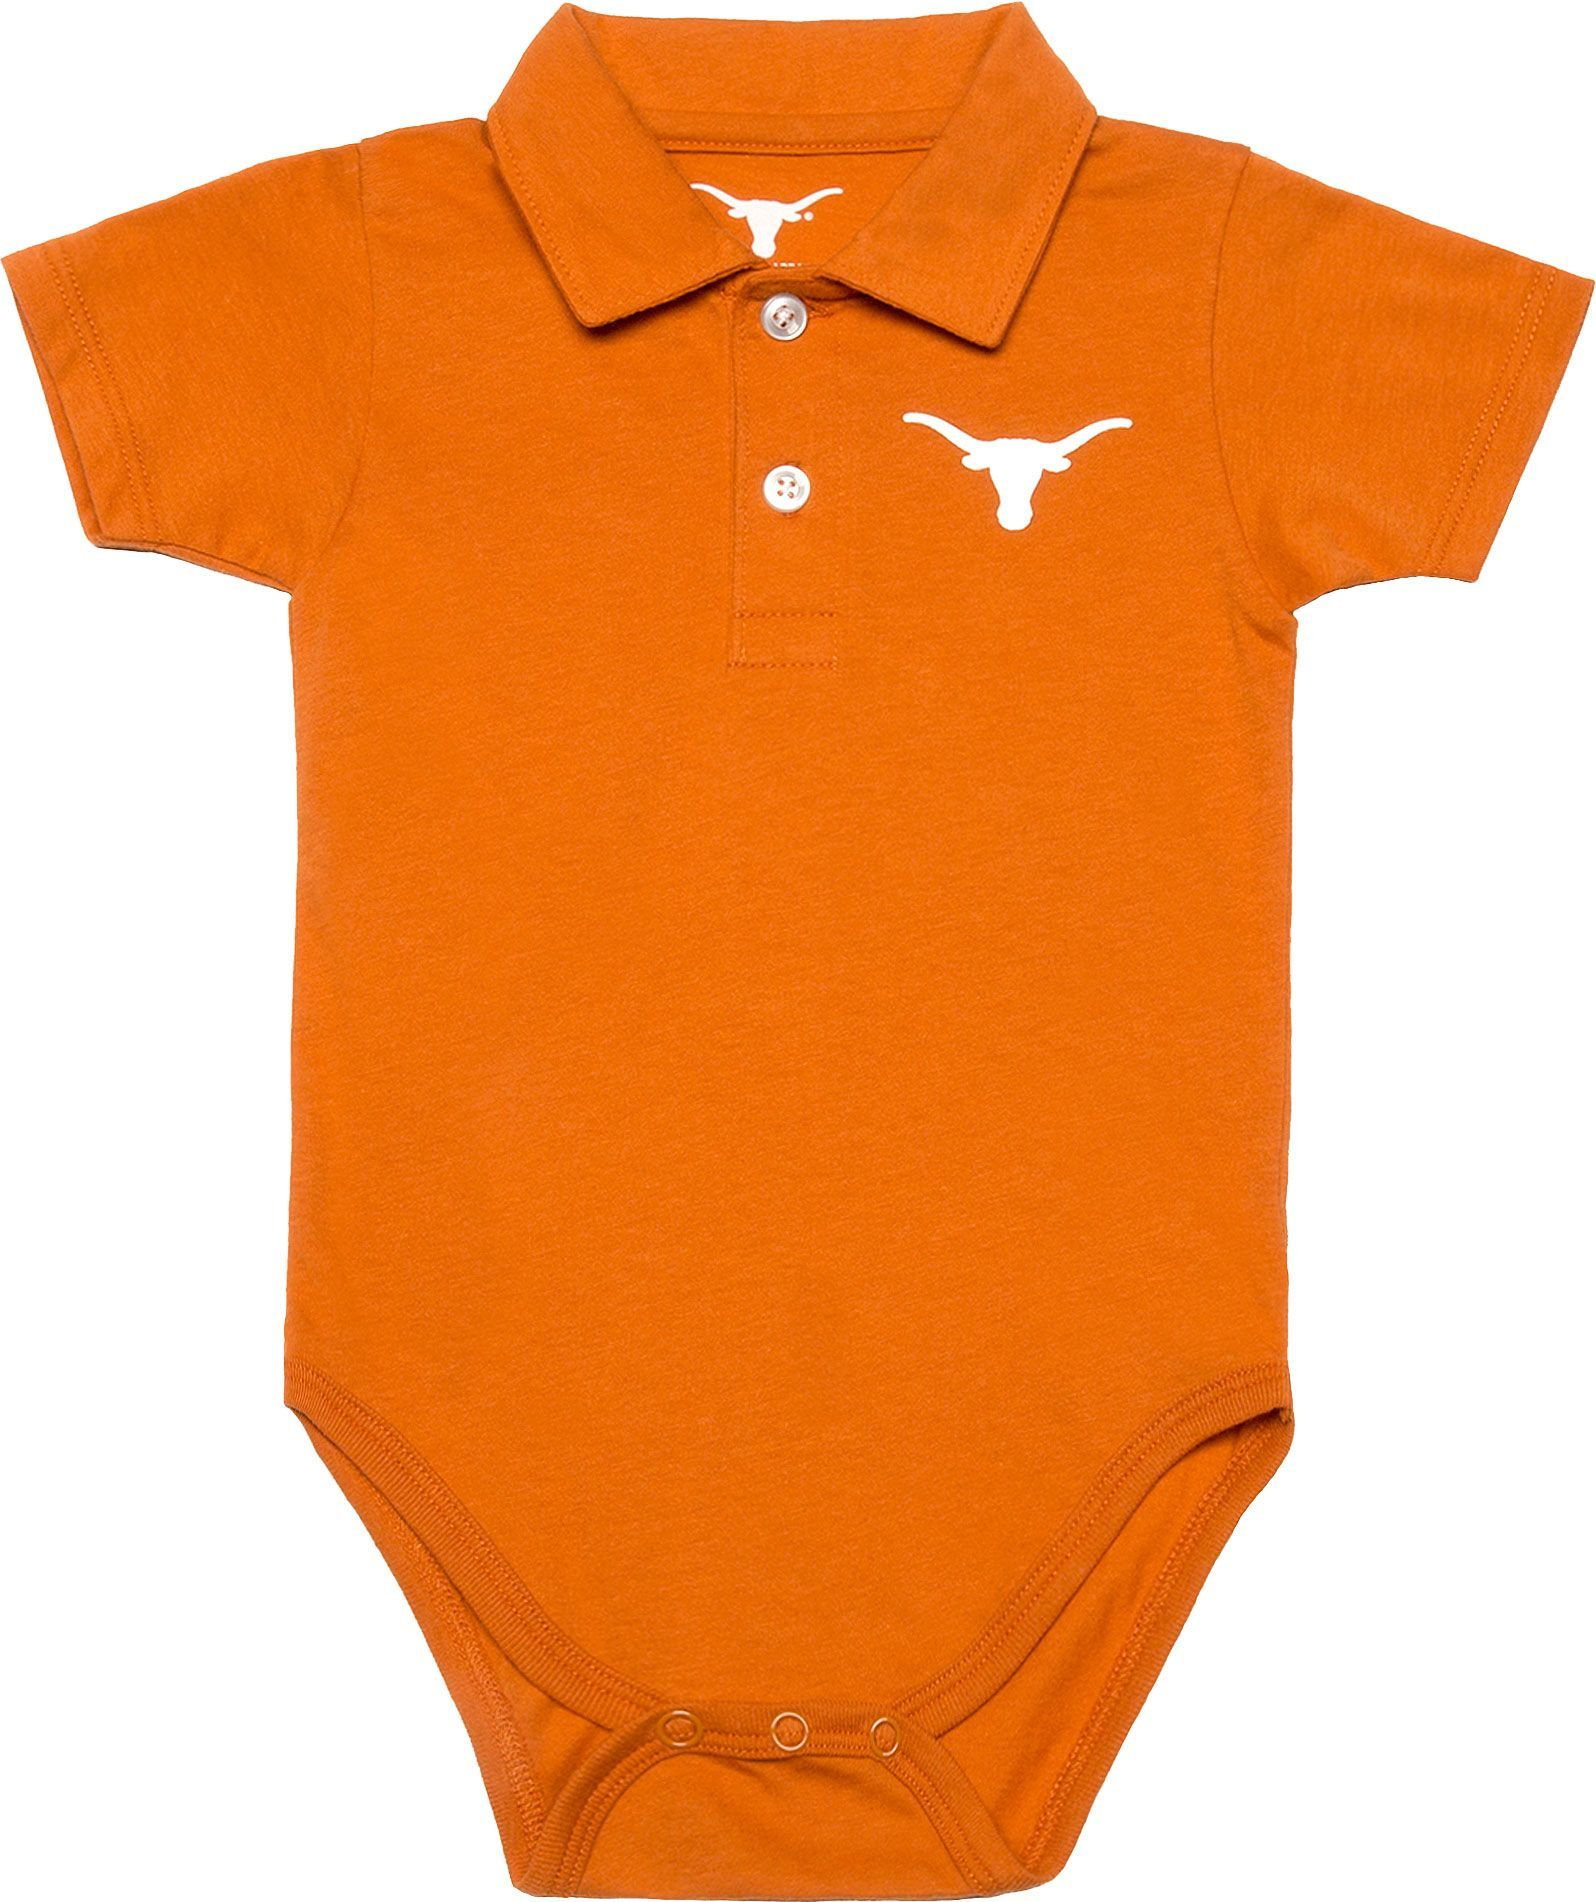 214c101e25451 University of Texas Authentic Apparel Infant Texas Longhorns Burnt Orange  Curt Polo Onesie